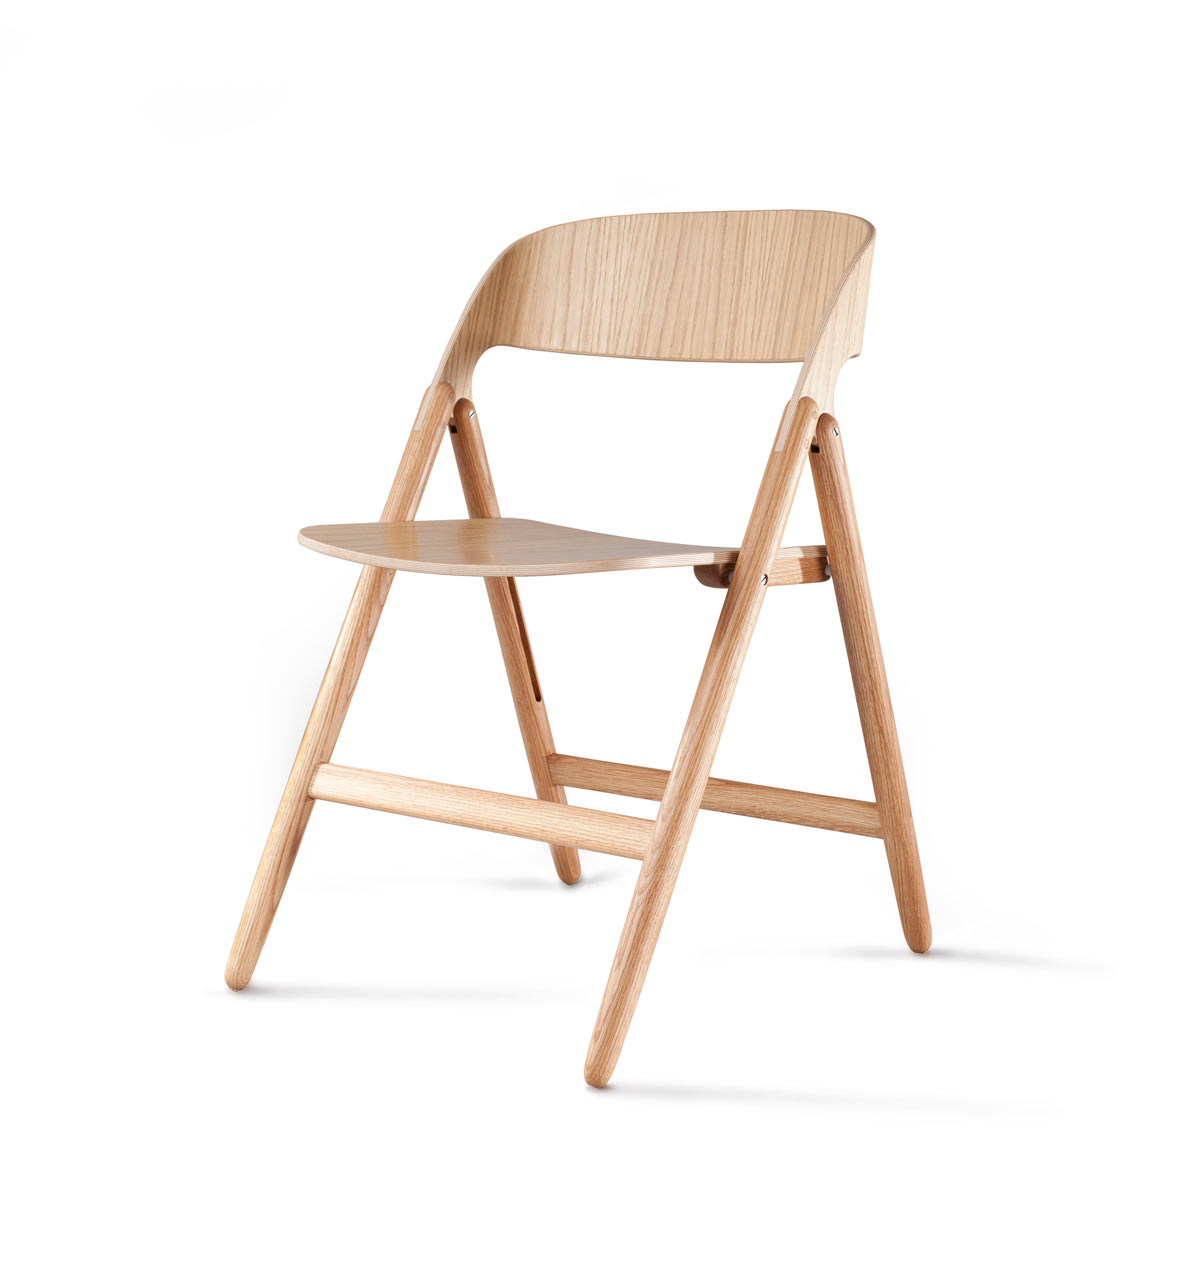 The Folding Chair Gets a Modern Update